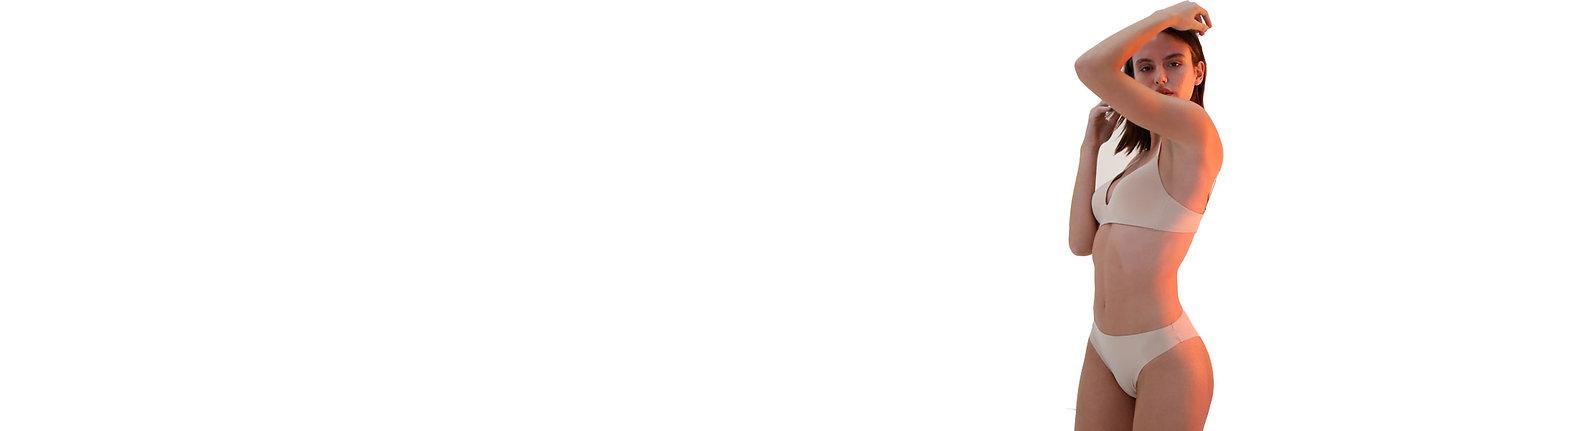 БАнер-результары3_1.jpg